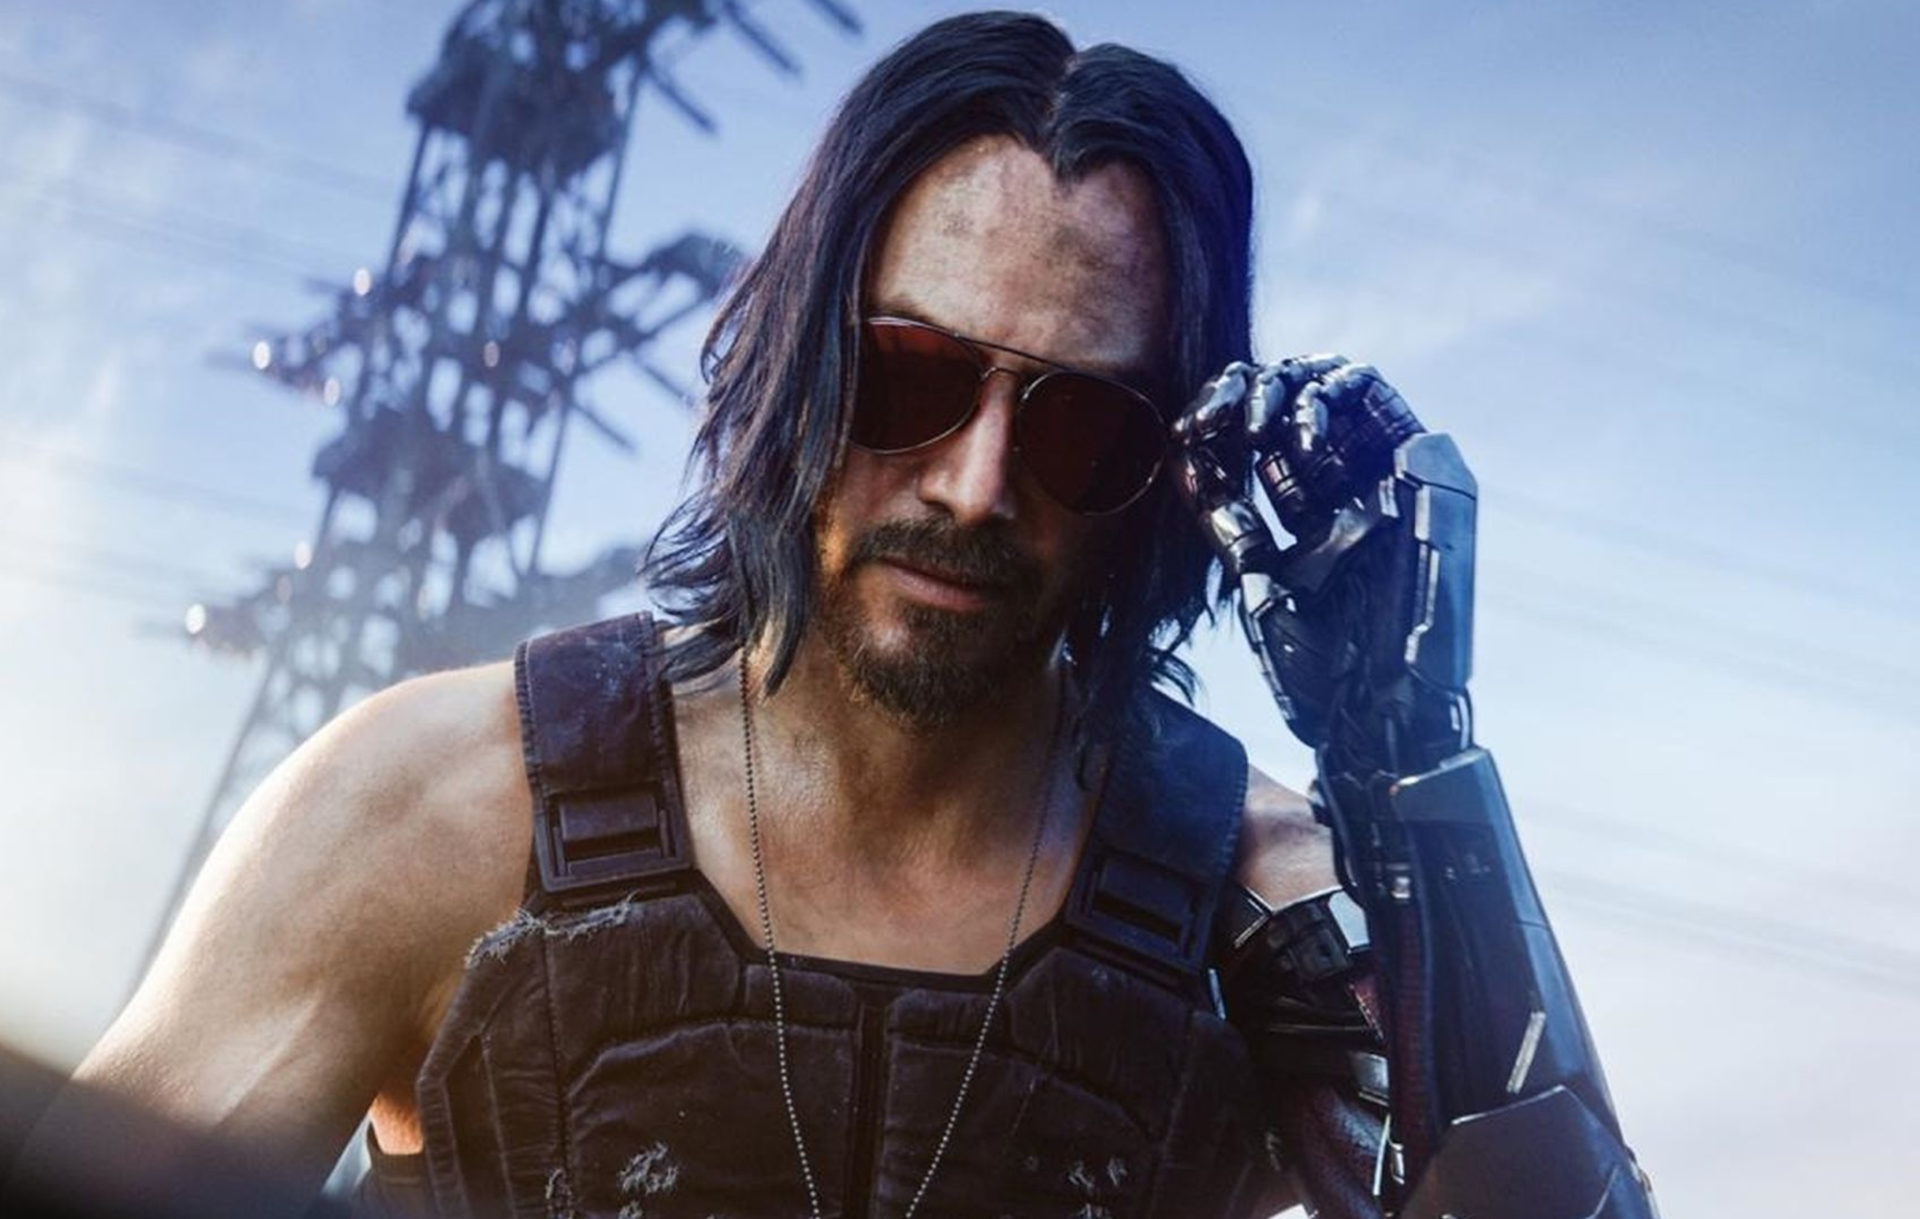 Keanu Reeves as featured in Cyberpunk 2077